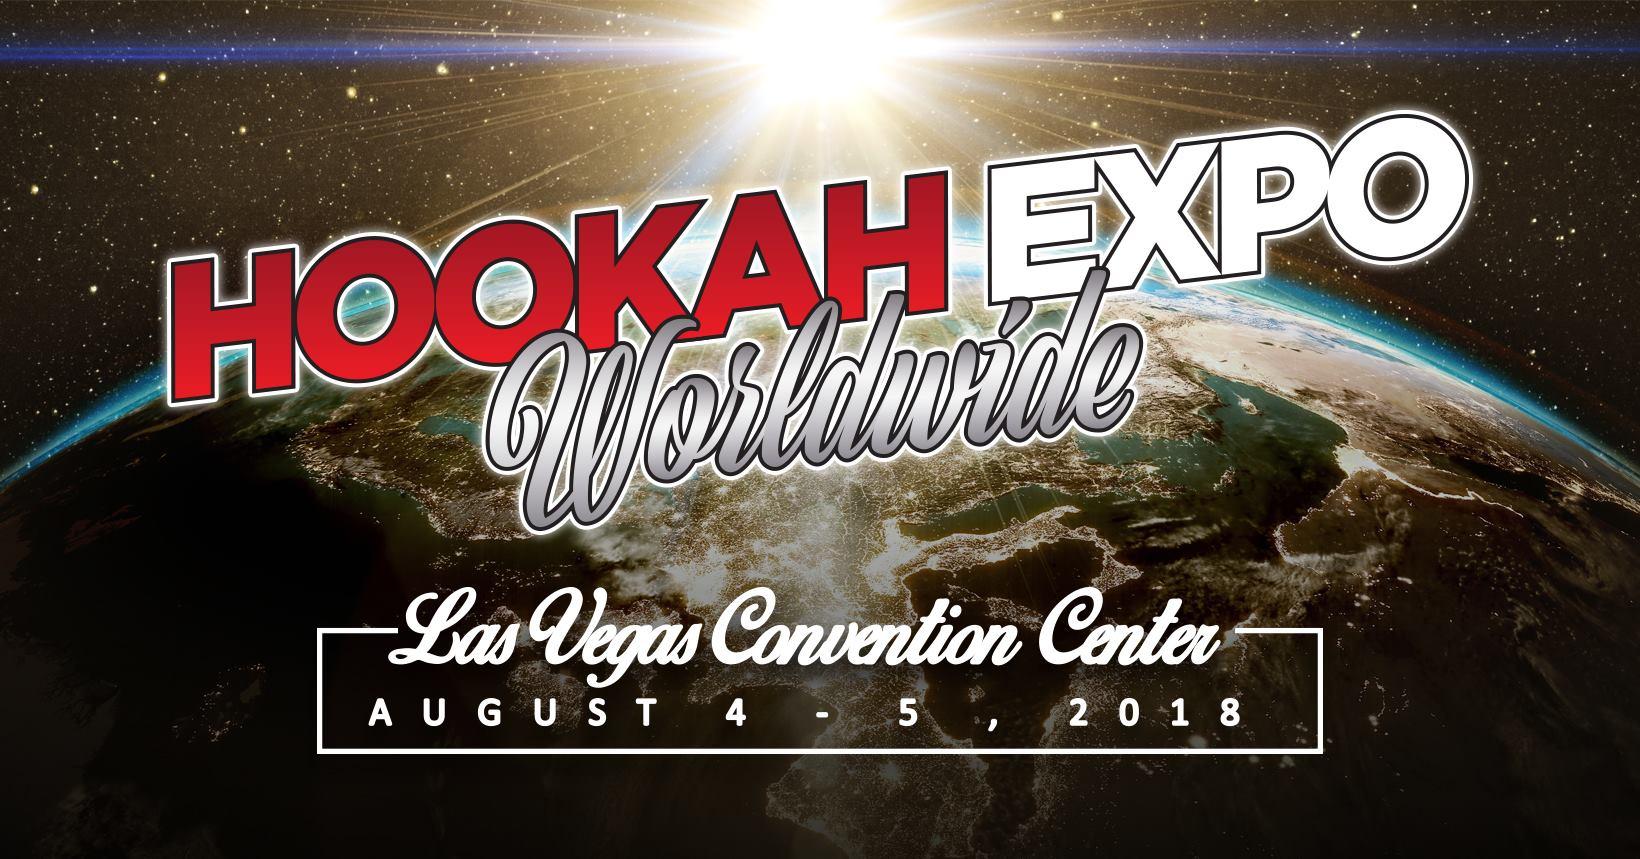 Hookah Expo Worldwide 2018 August 4-5